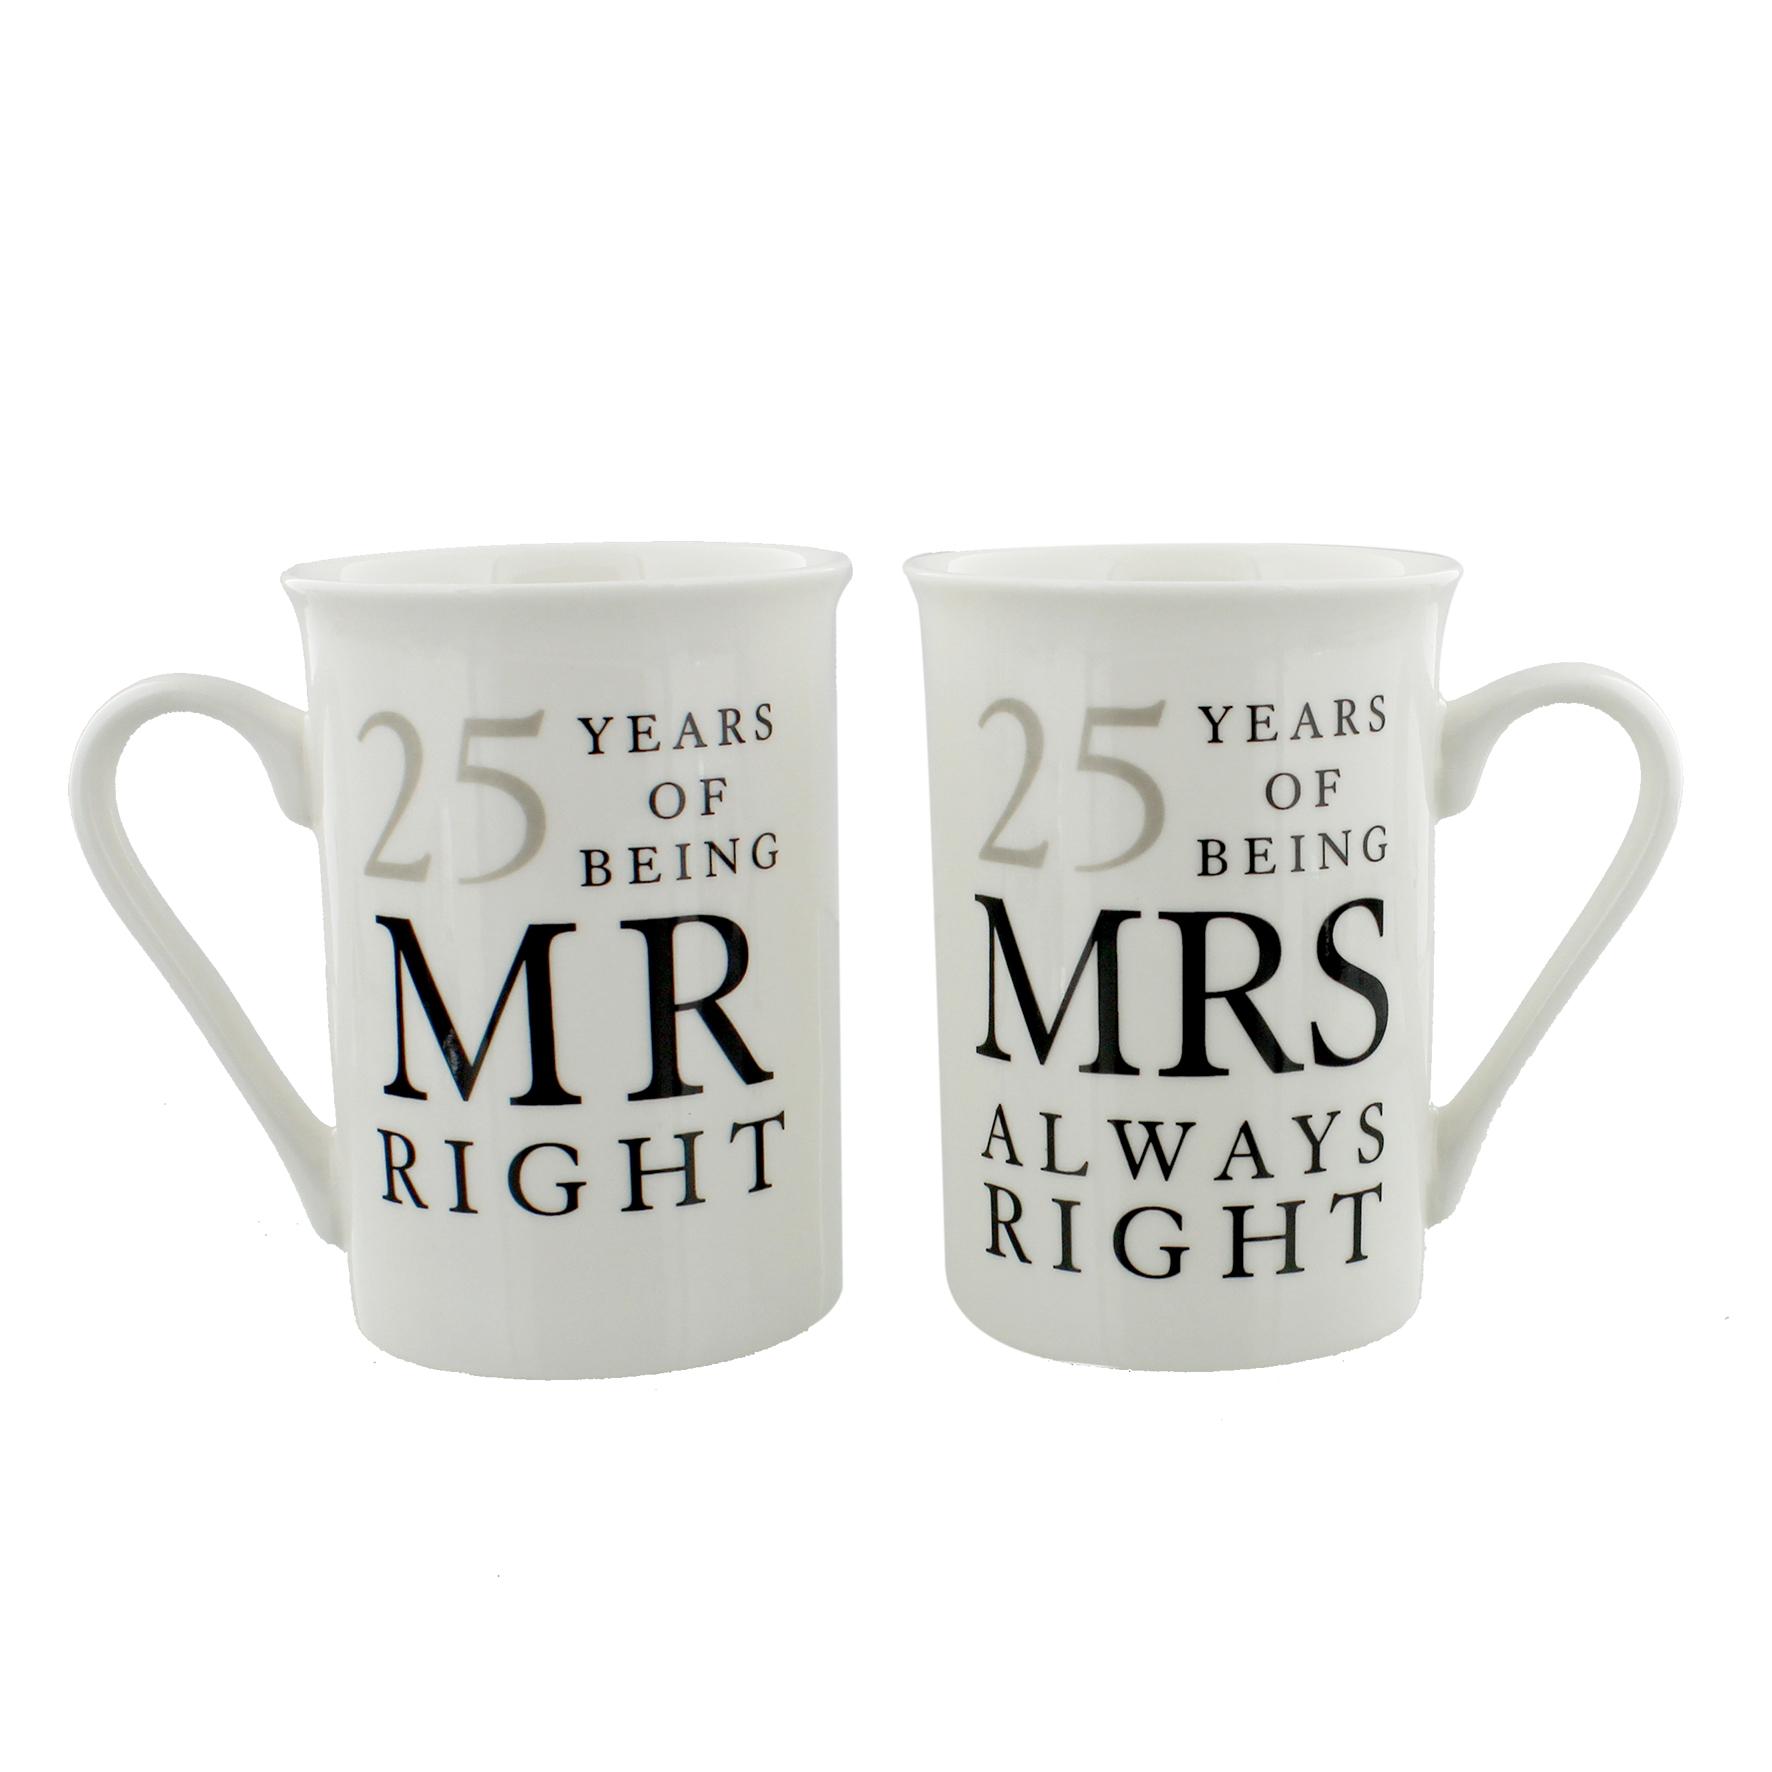 25 Year Wedding Anniversary Gift Ideas: 25 Years Mr & Mrs Mugs Amore Mug Set In A Gift Box